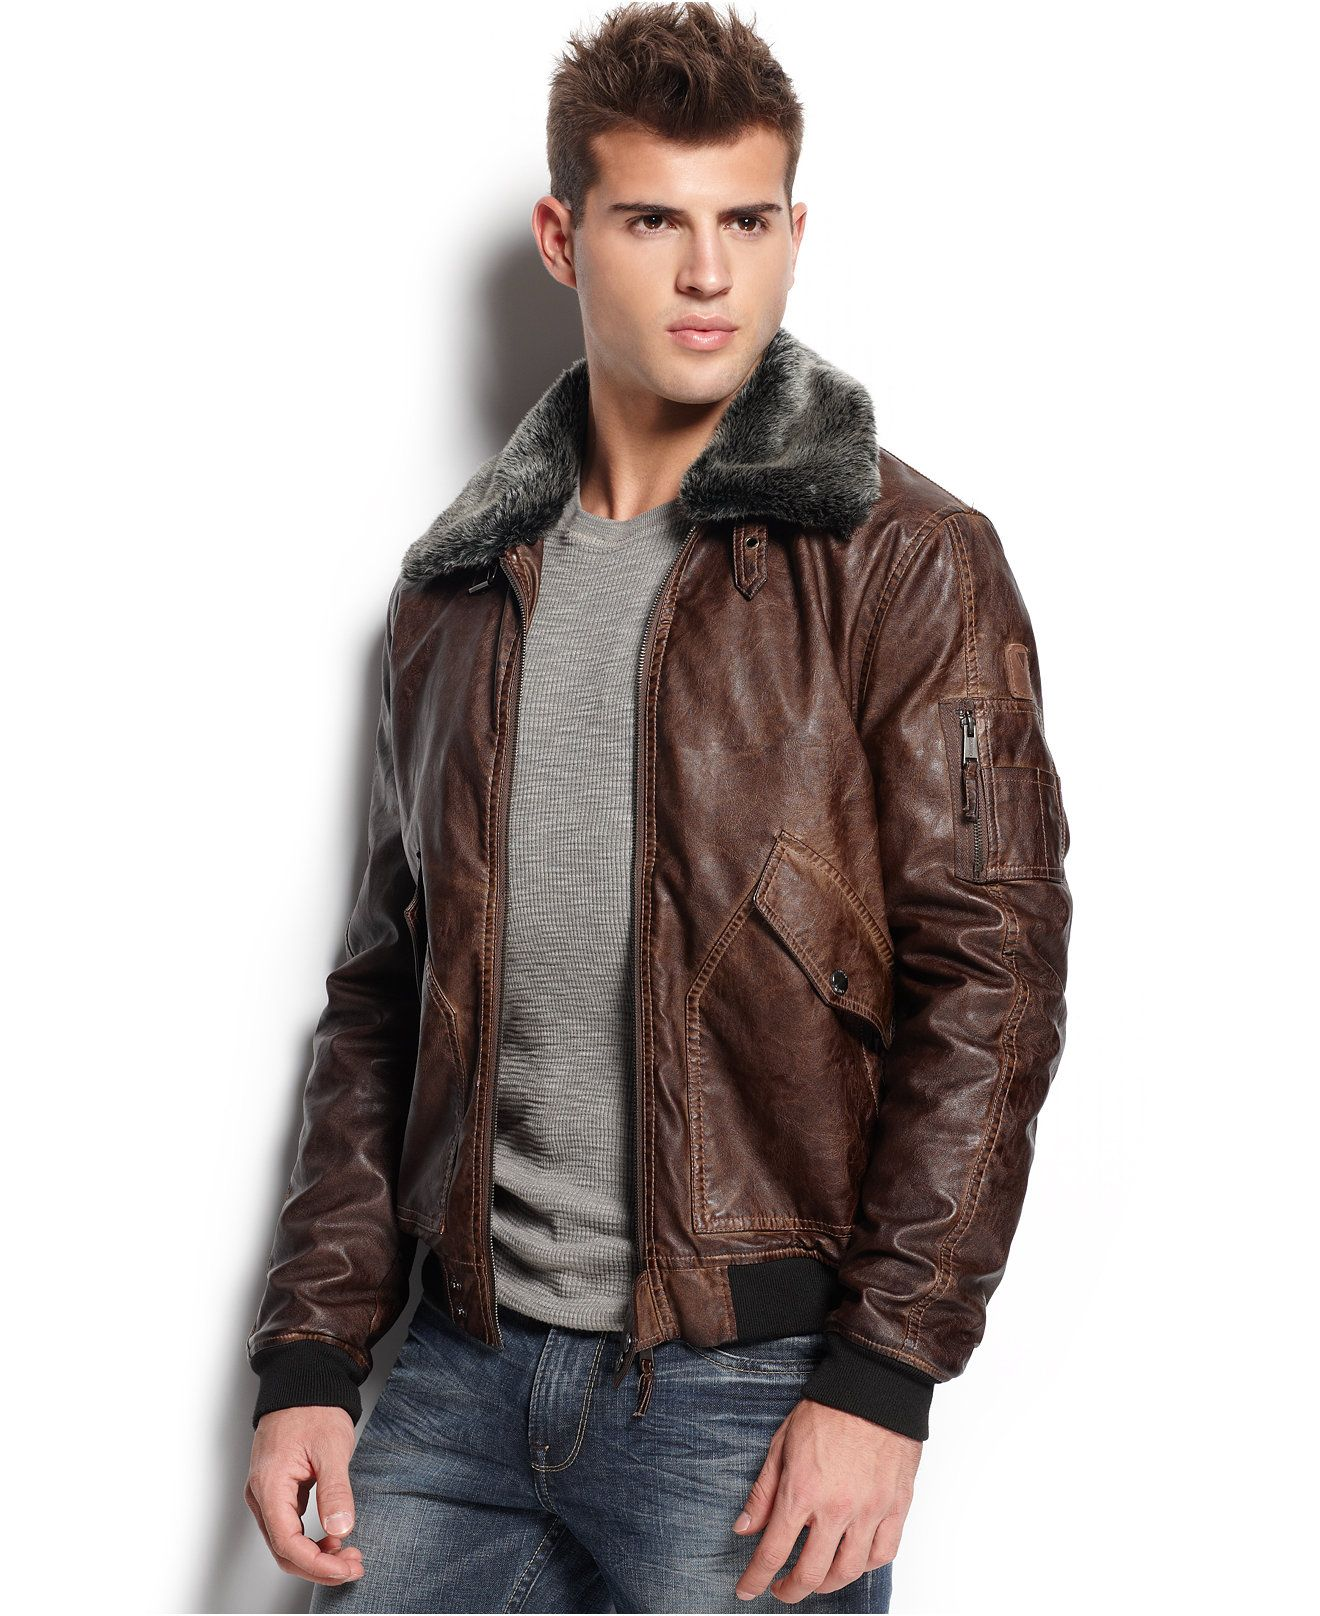 GUESS Faux Leather Aviator Jacket Coats & Jackets Men